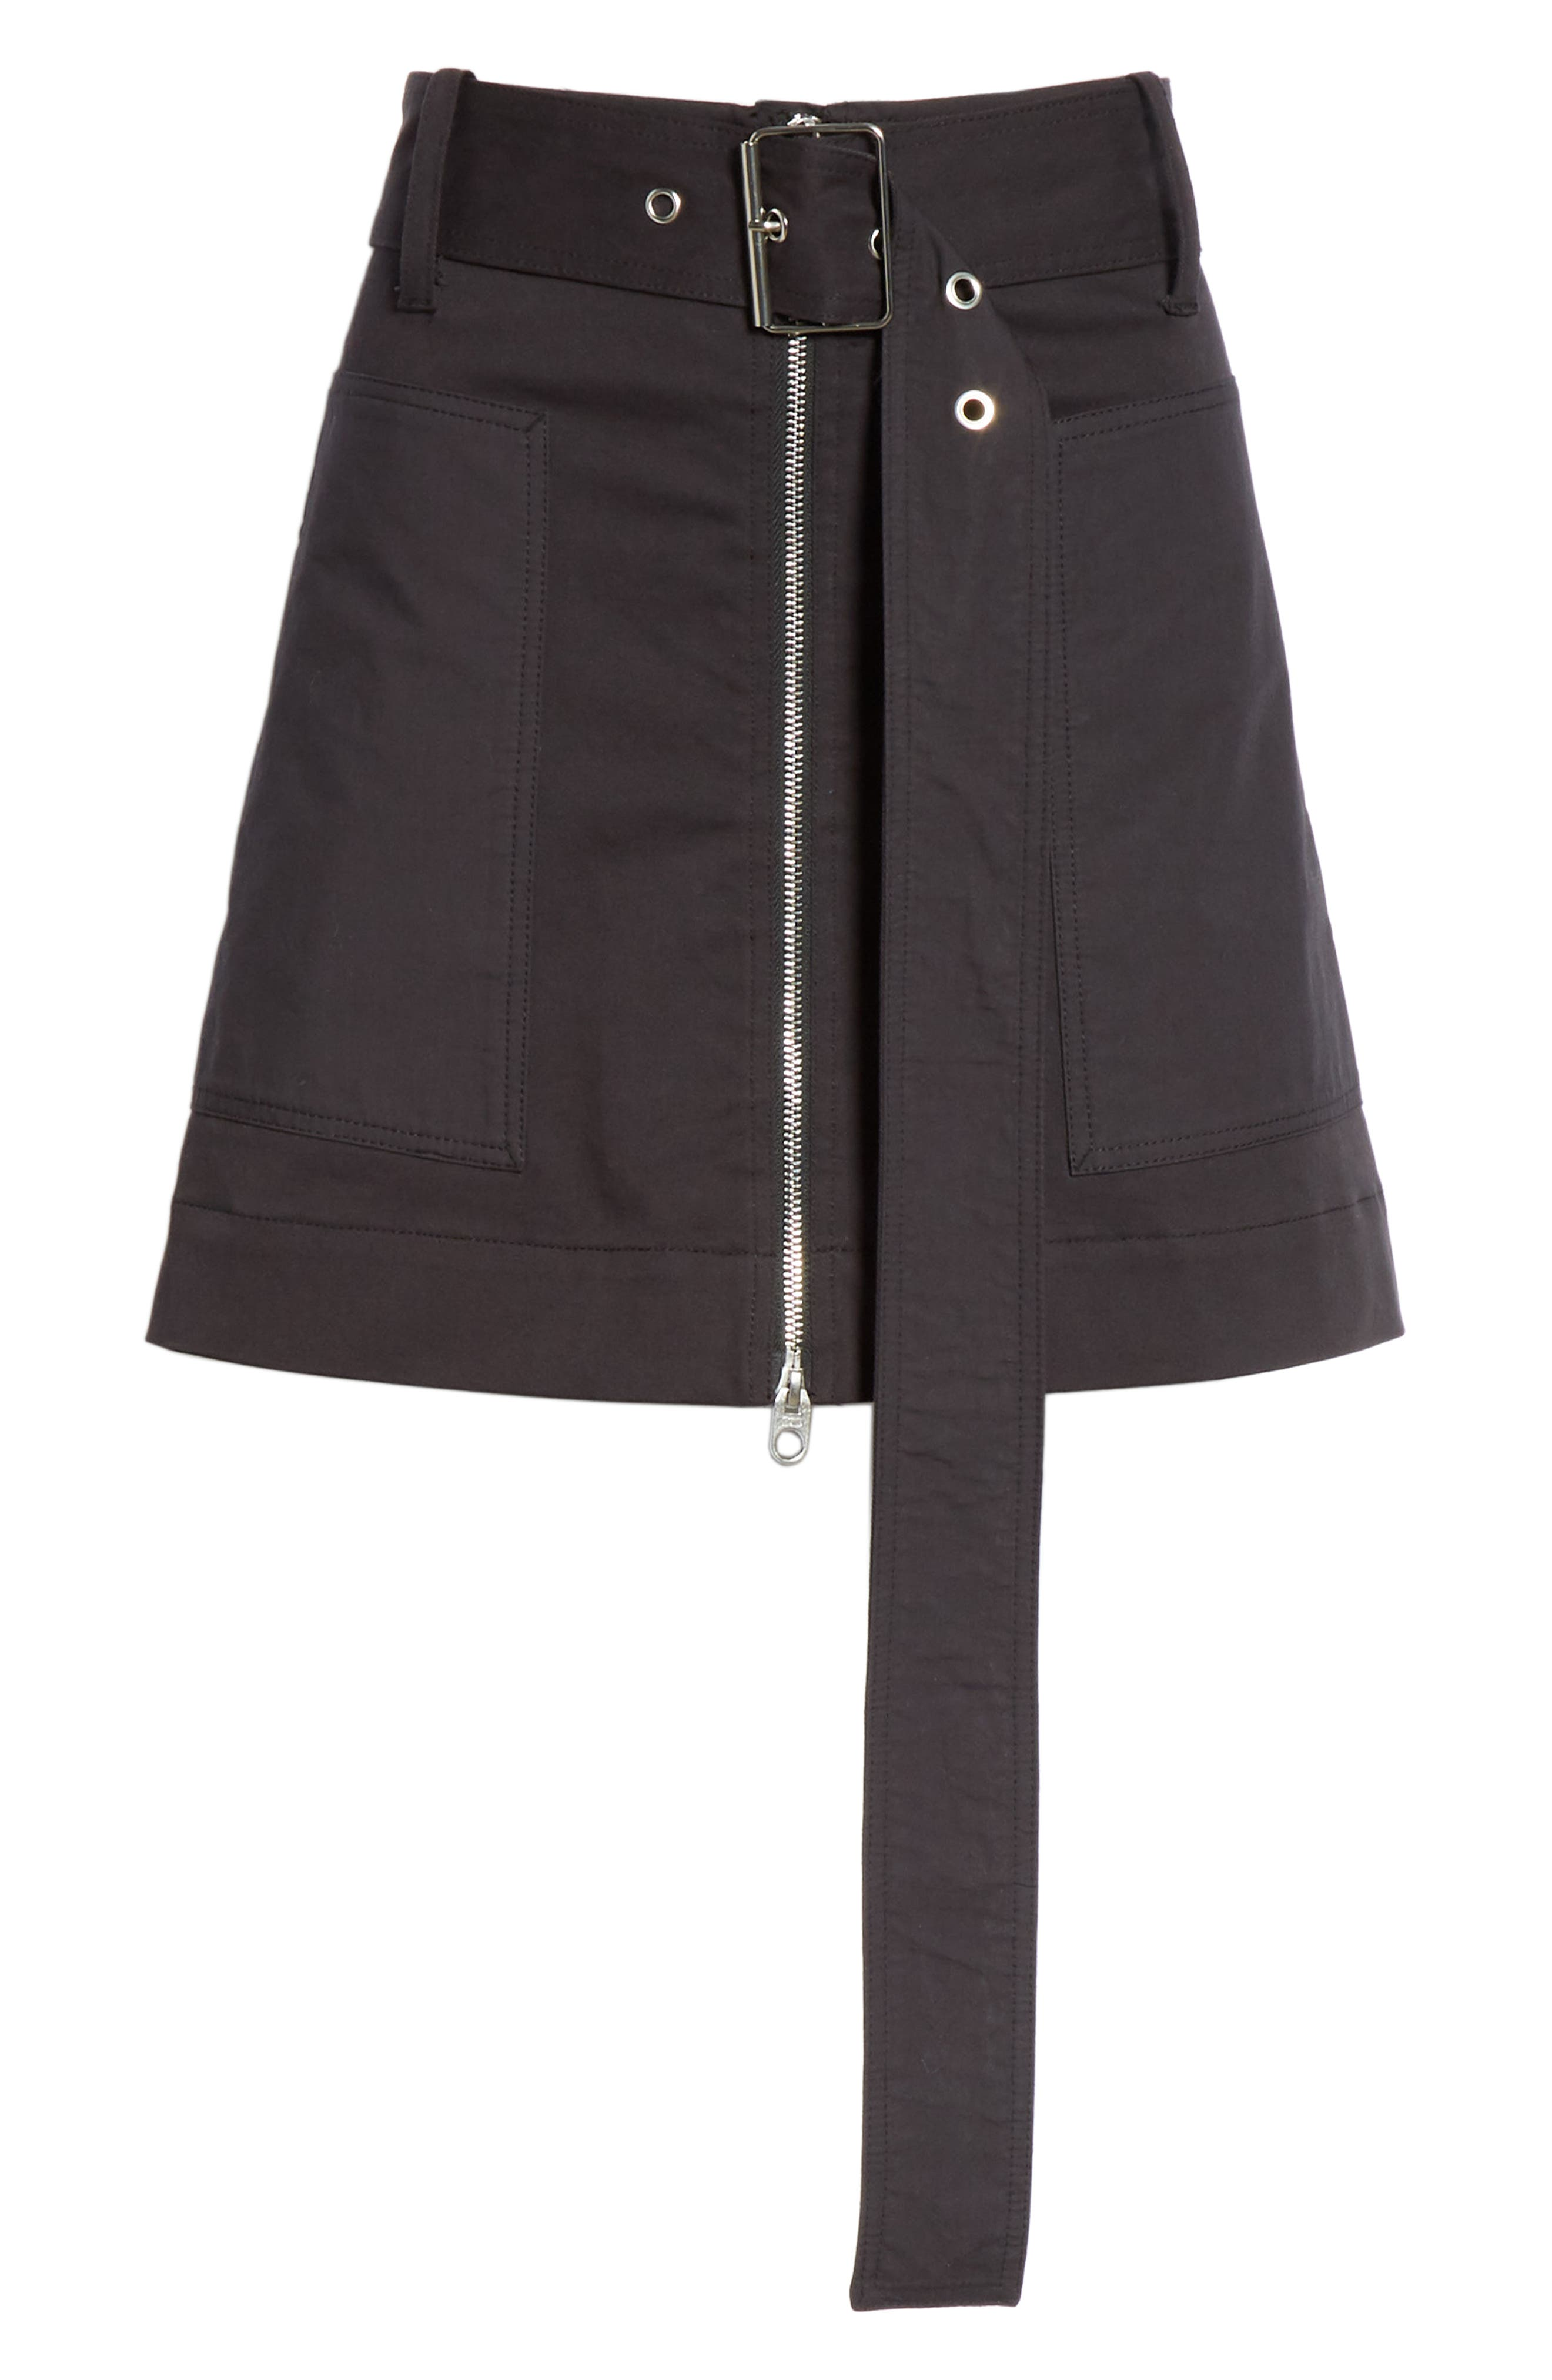 PROENZA SCHOULER, PSWL Belted Utility Skirt, Alternate thumbnail 6, color, BLACK